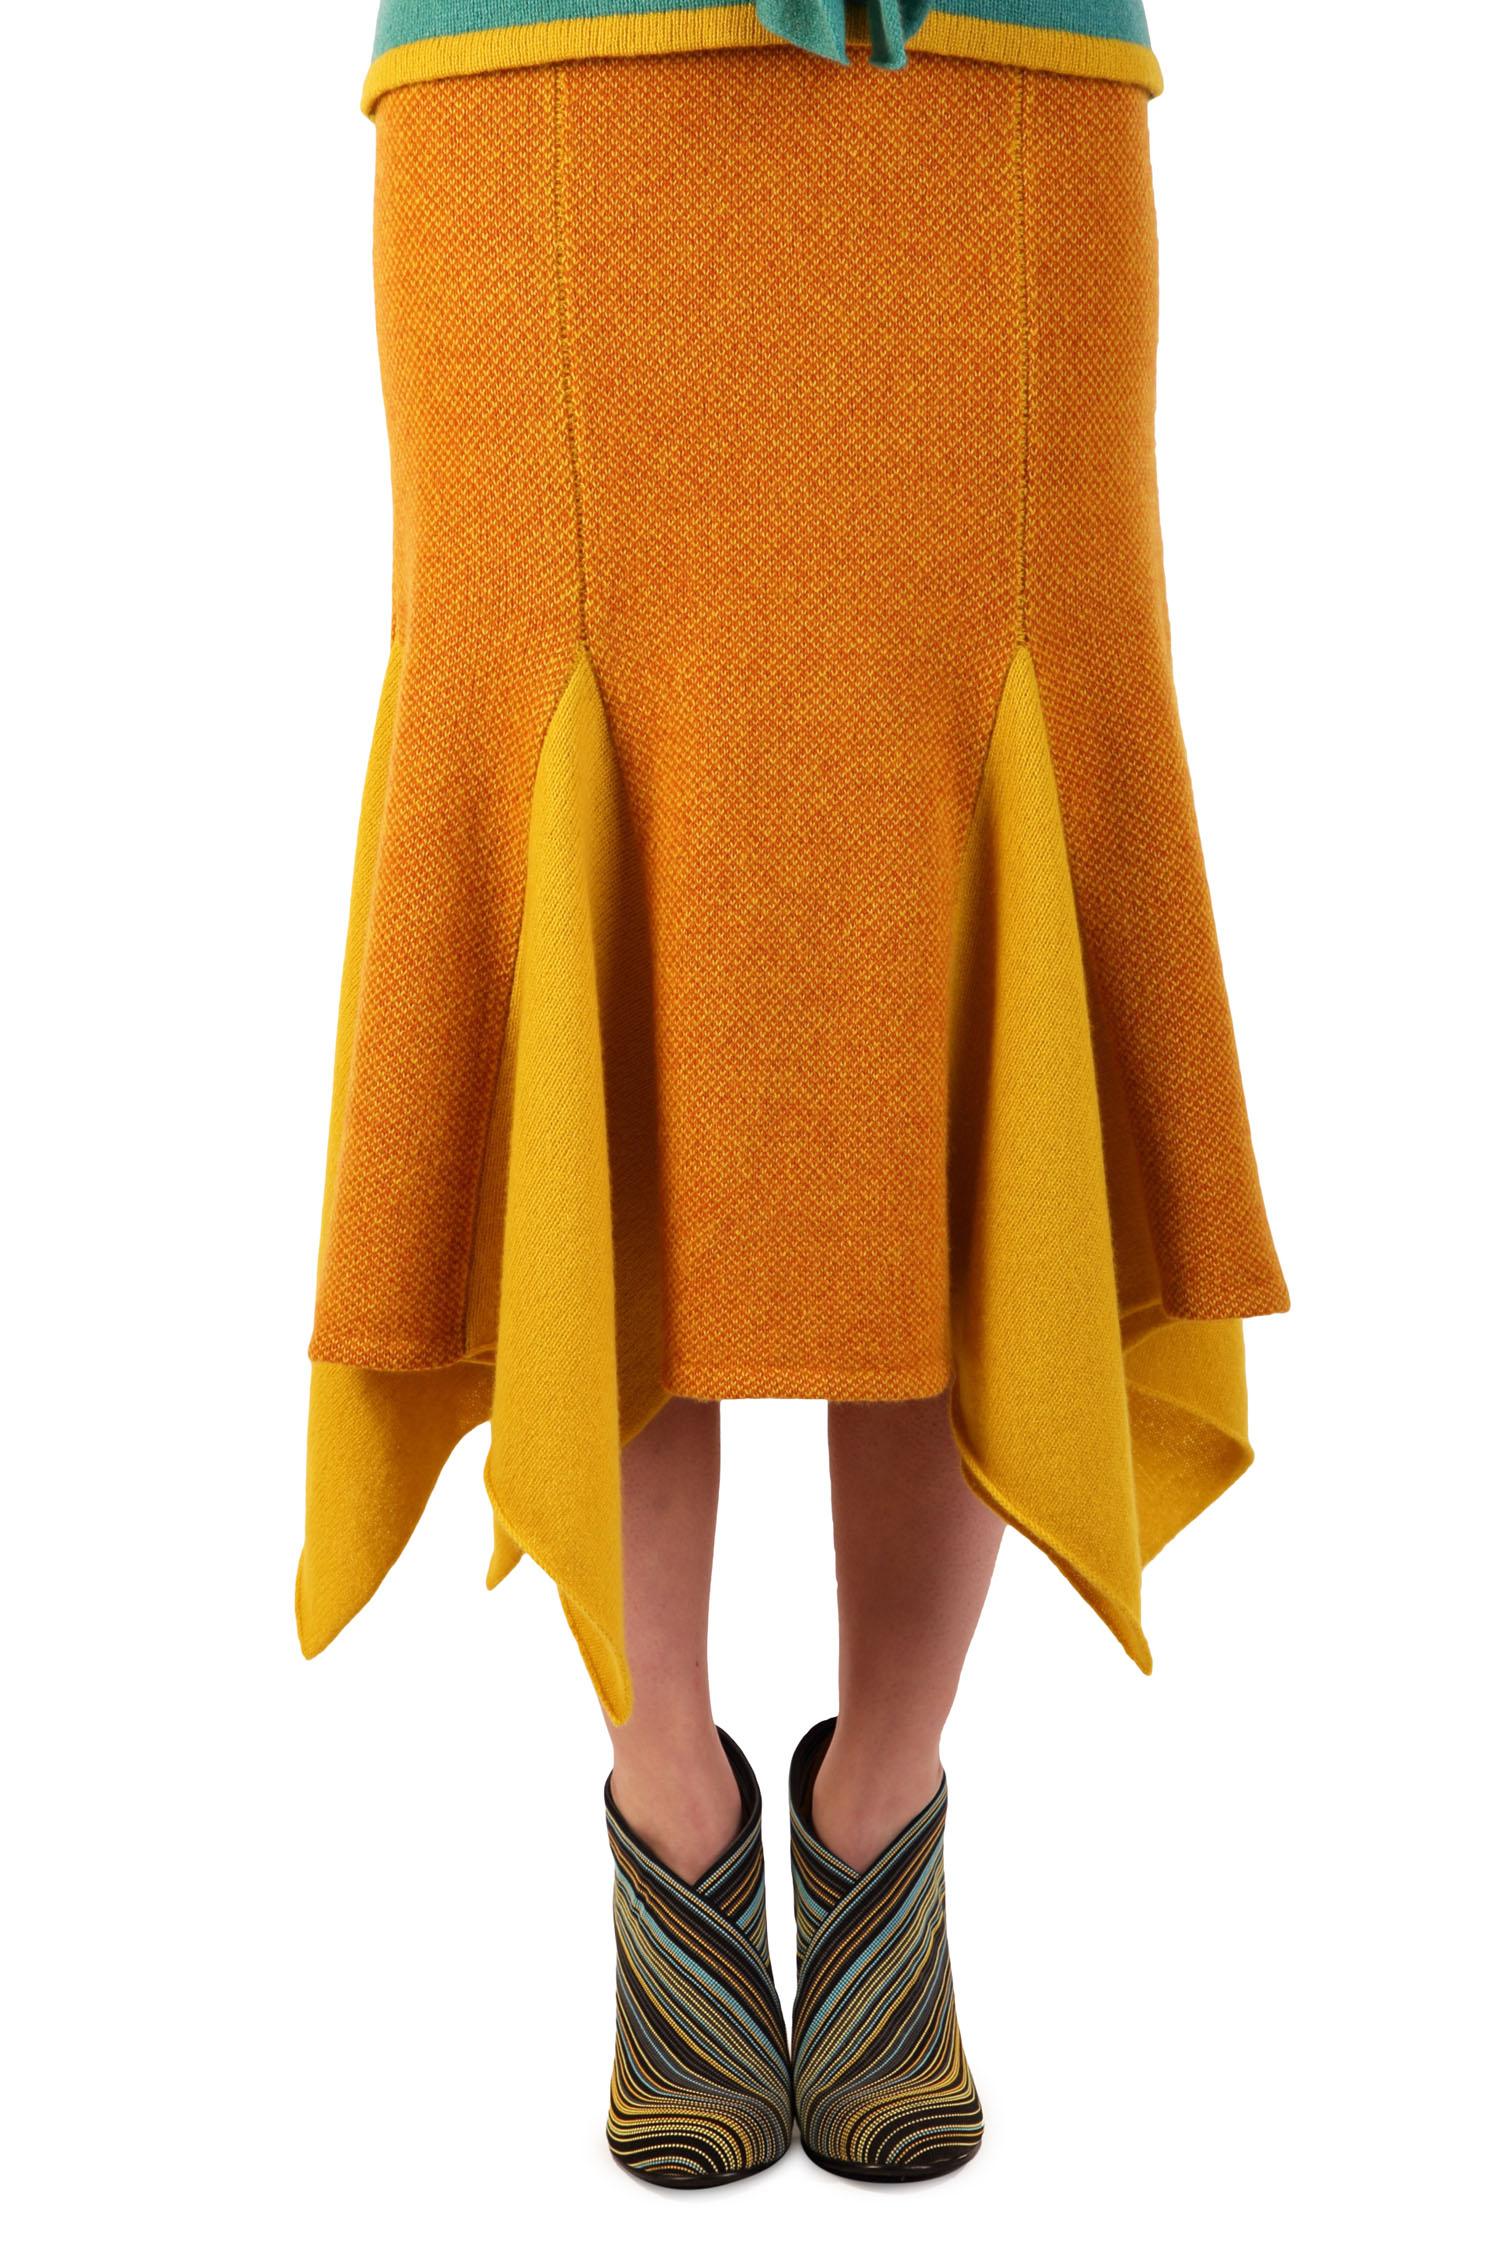 Ochre tweed skirt1